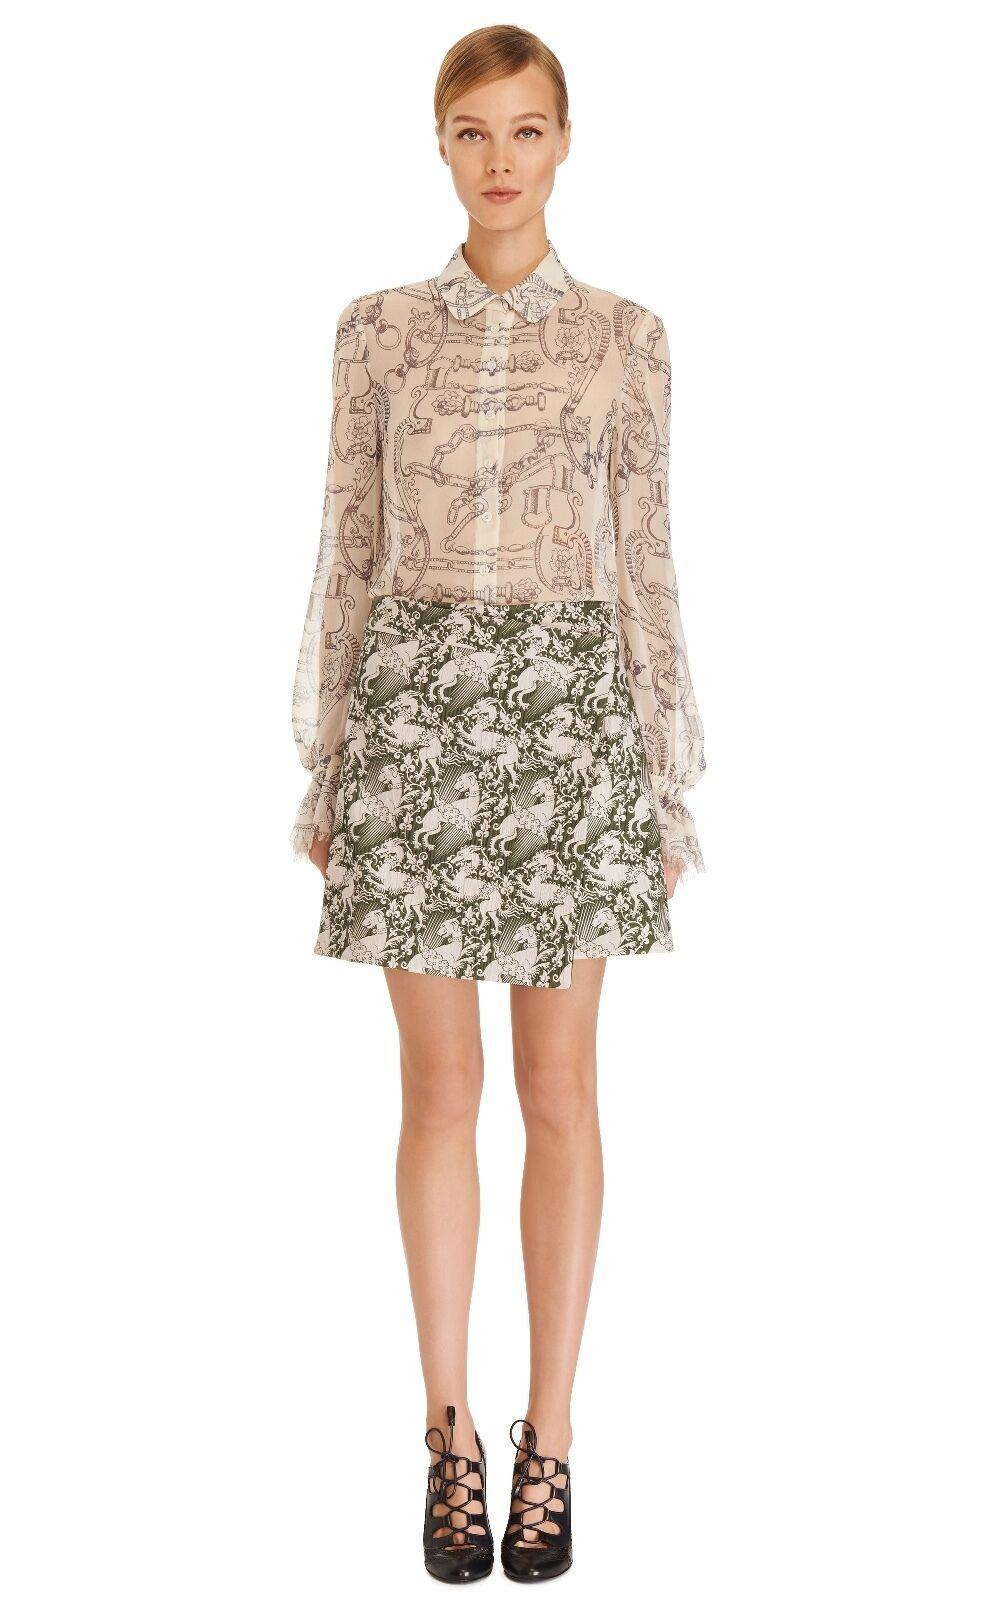 Tory Burch Dress Shirt Silk Sherry Top 14 Blouse Equestrian Sheer XL RUNWAY